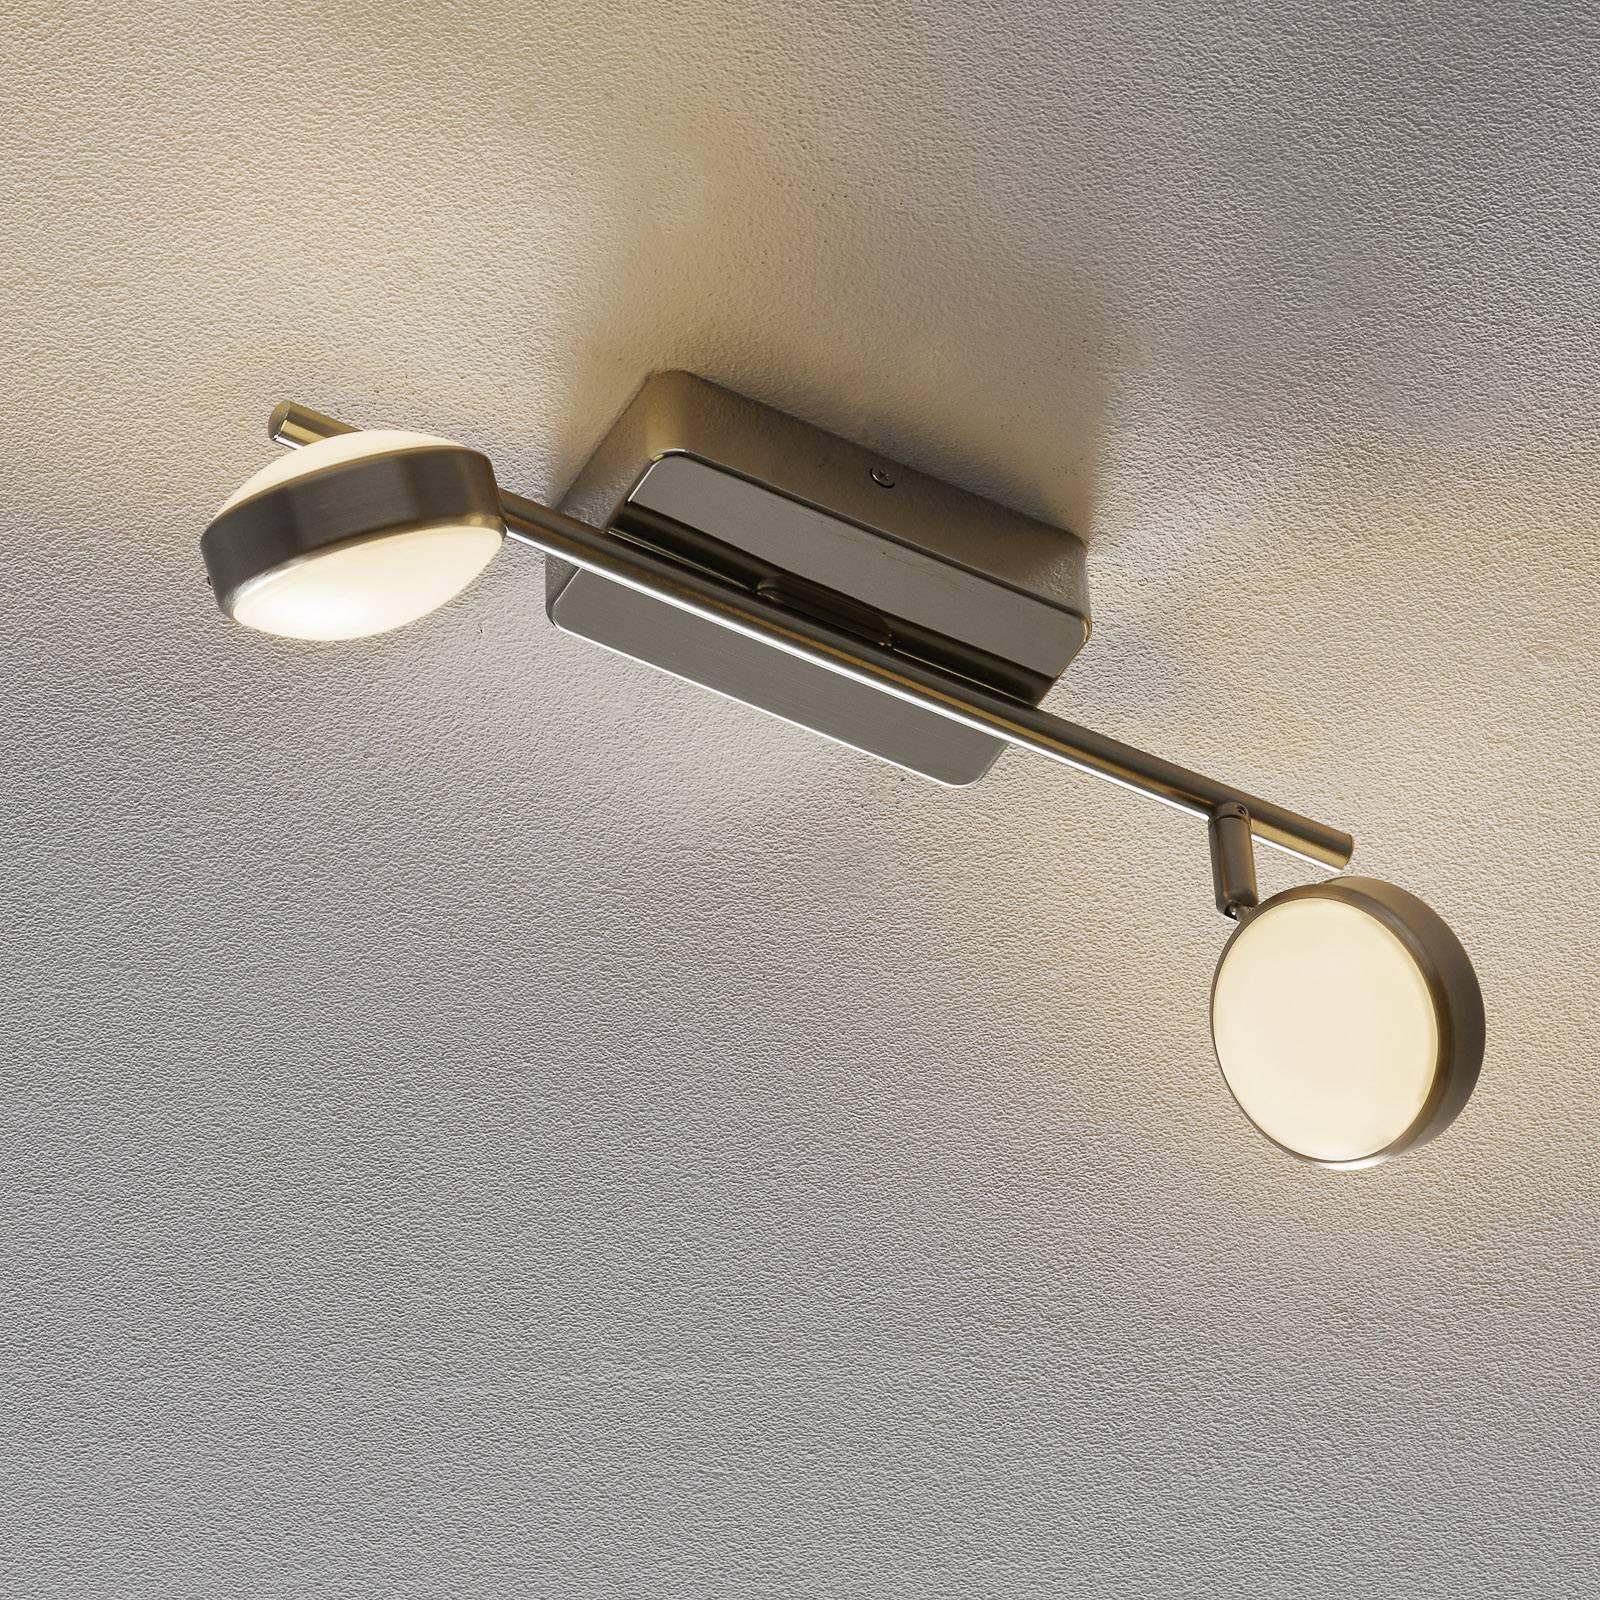 EGLO connect Corropoli-C-LED-kattospotti 2-lamp.